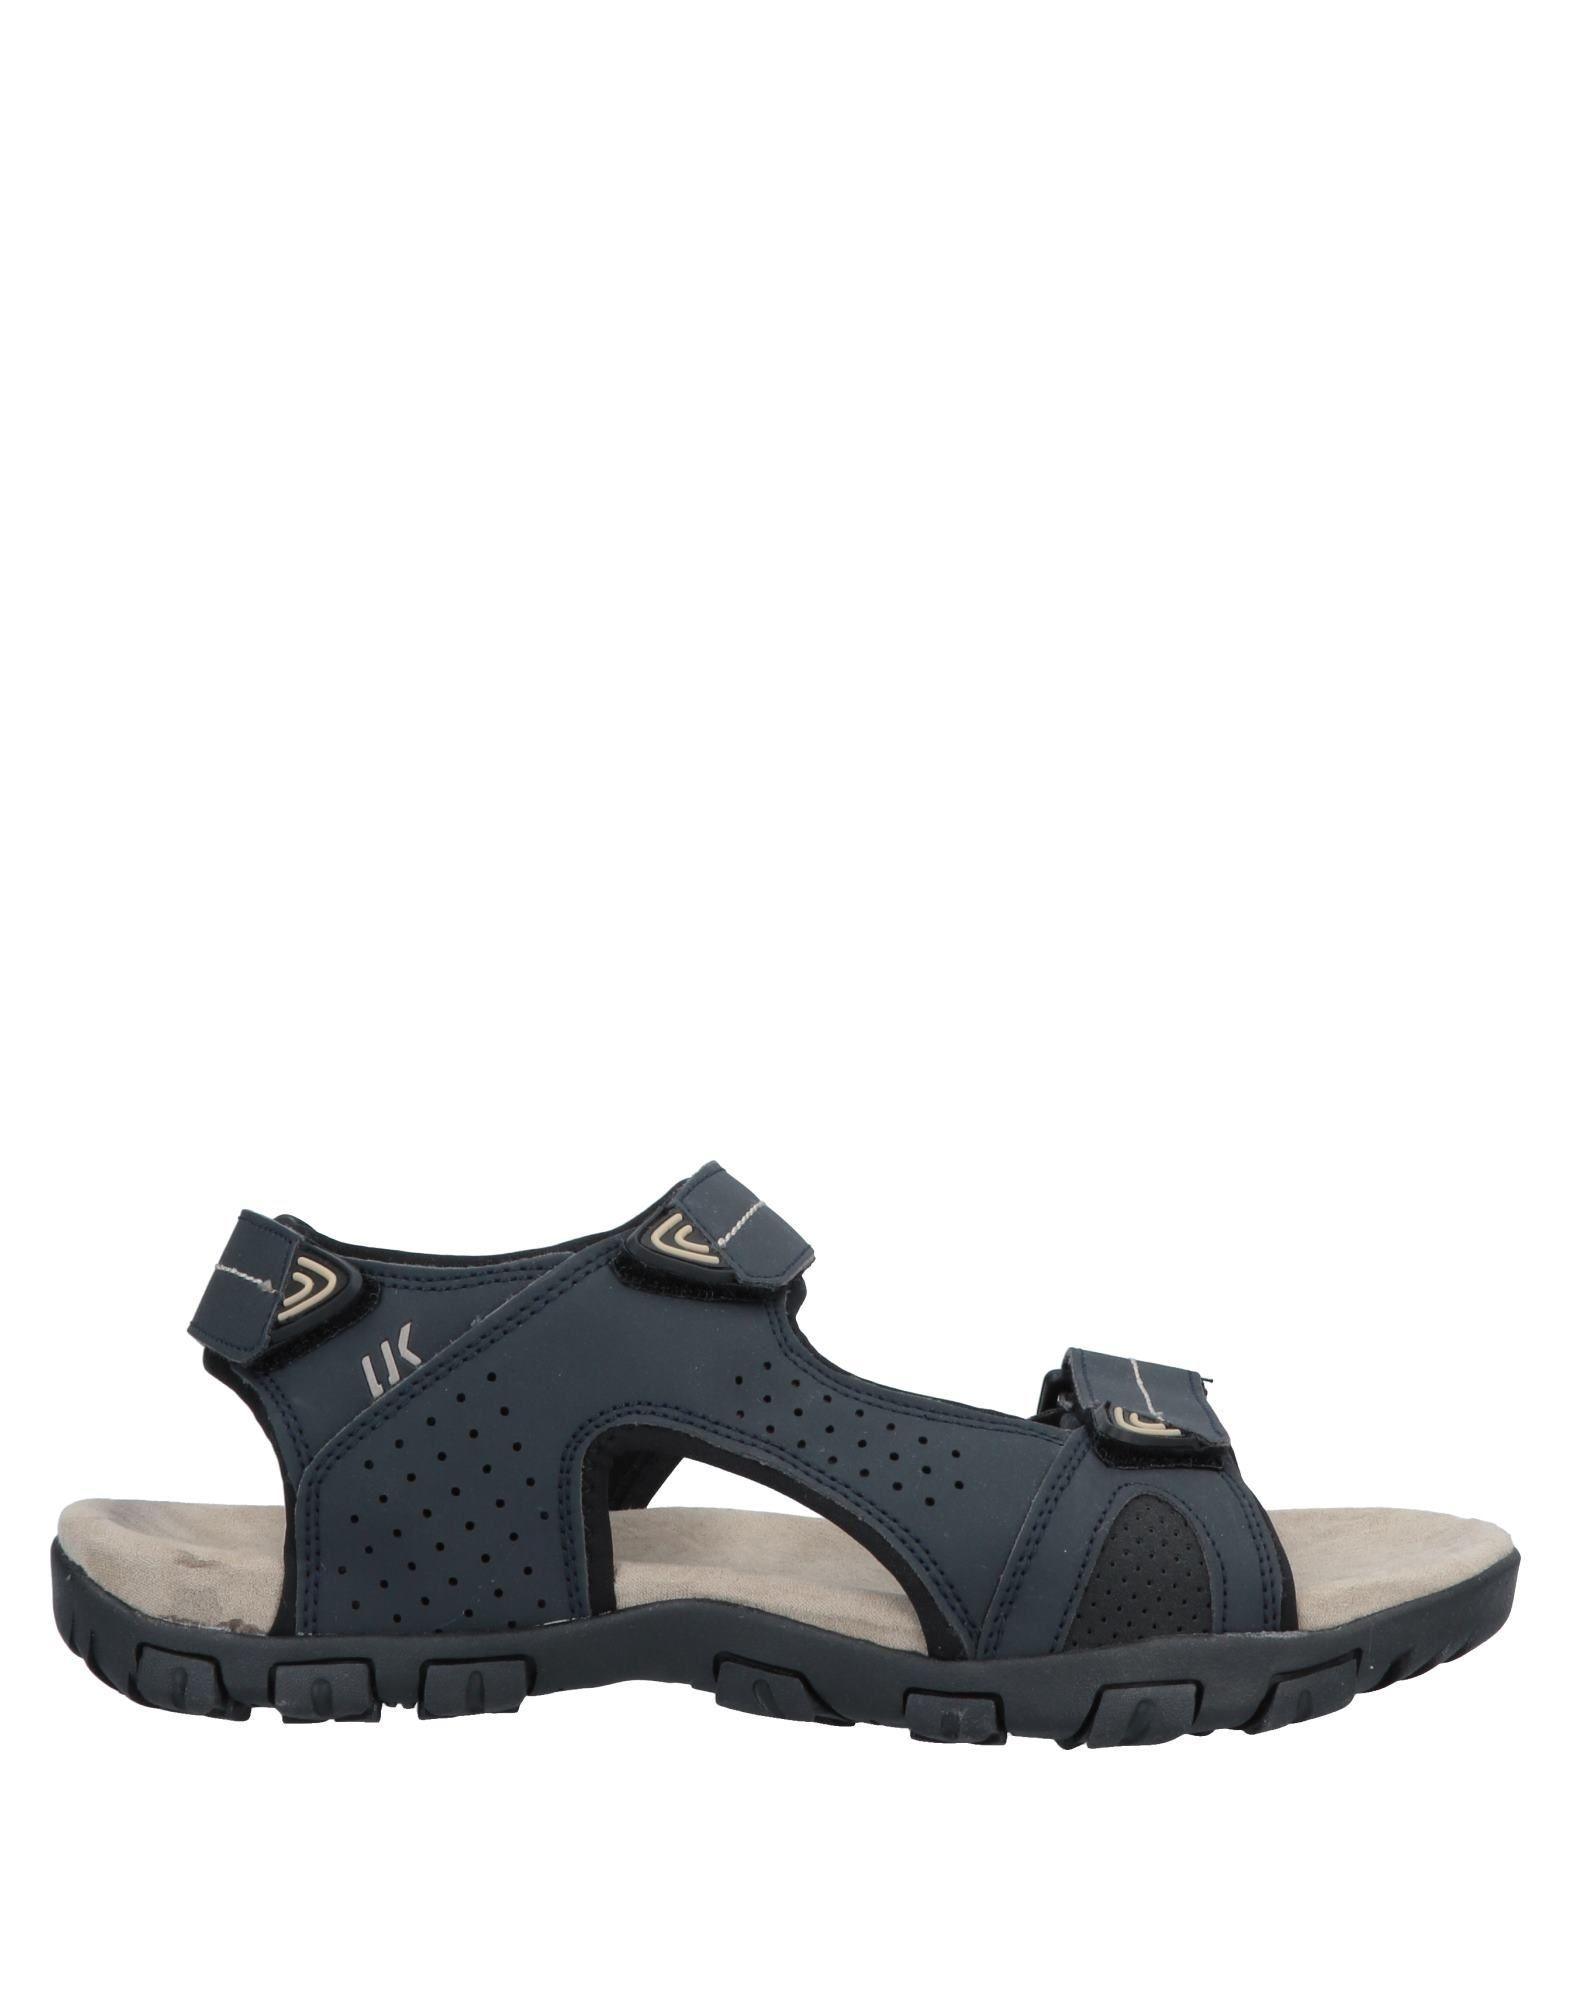 413353a8cf32 Lumberjack Sandals in Blue for Men - Lyst